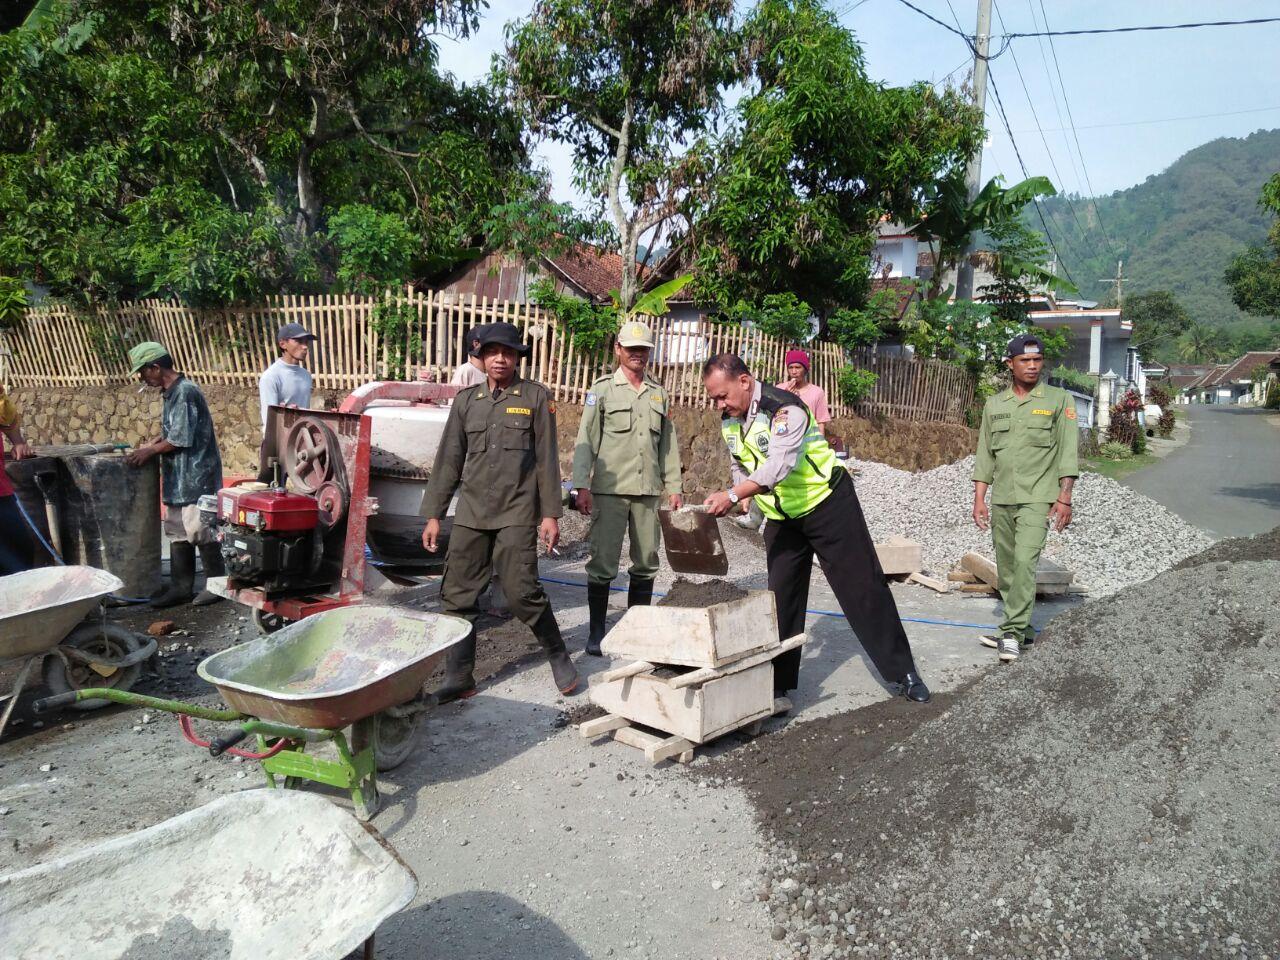 Bhabinkamtibmas Desa Waturejo Polres Batu Membantu Dalam Pengecoran Bahu Jalan Bersama Linmas